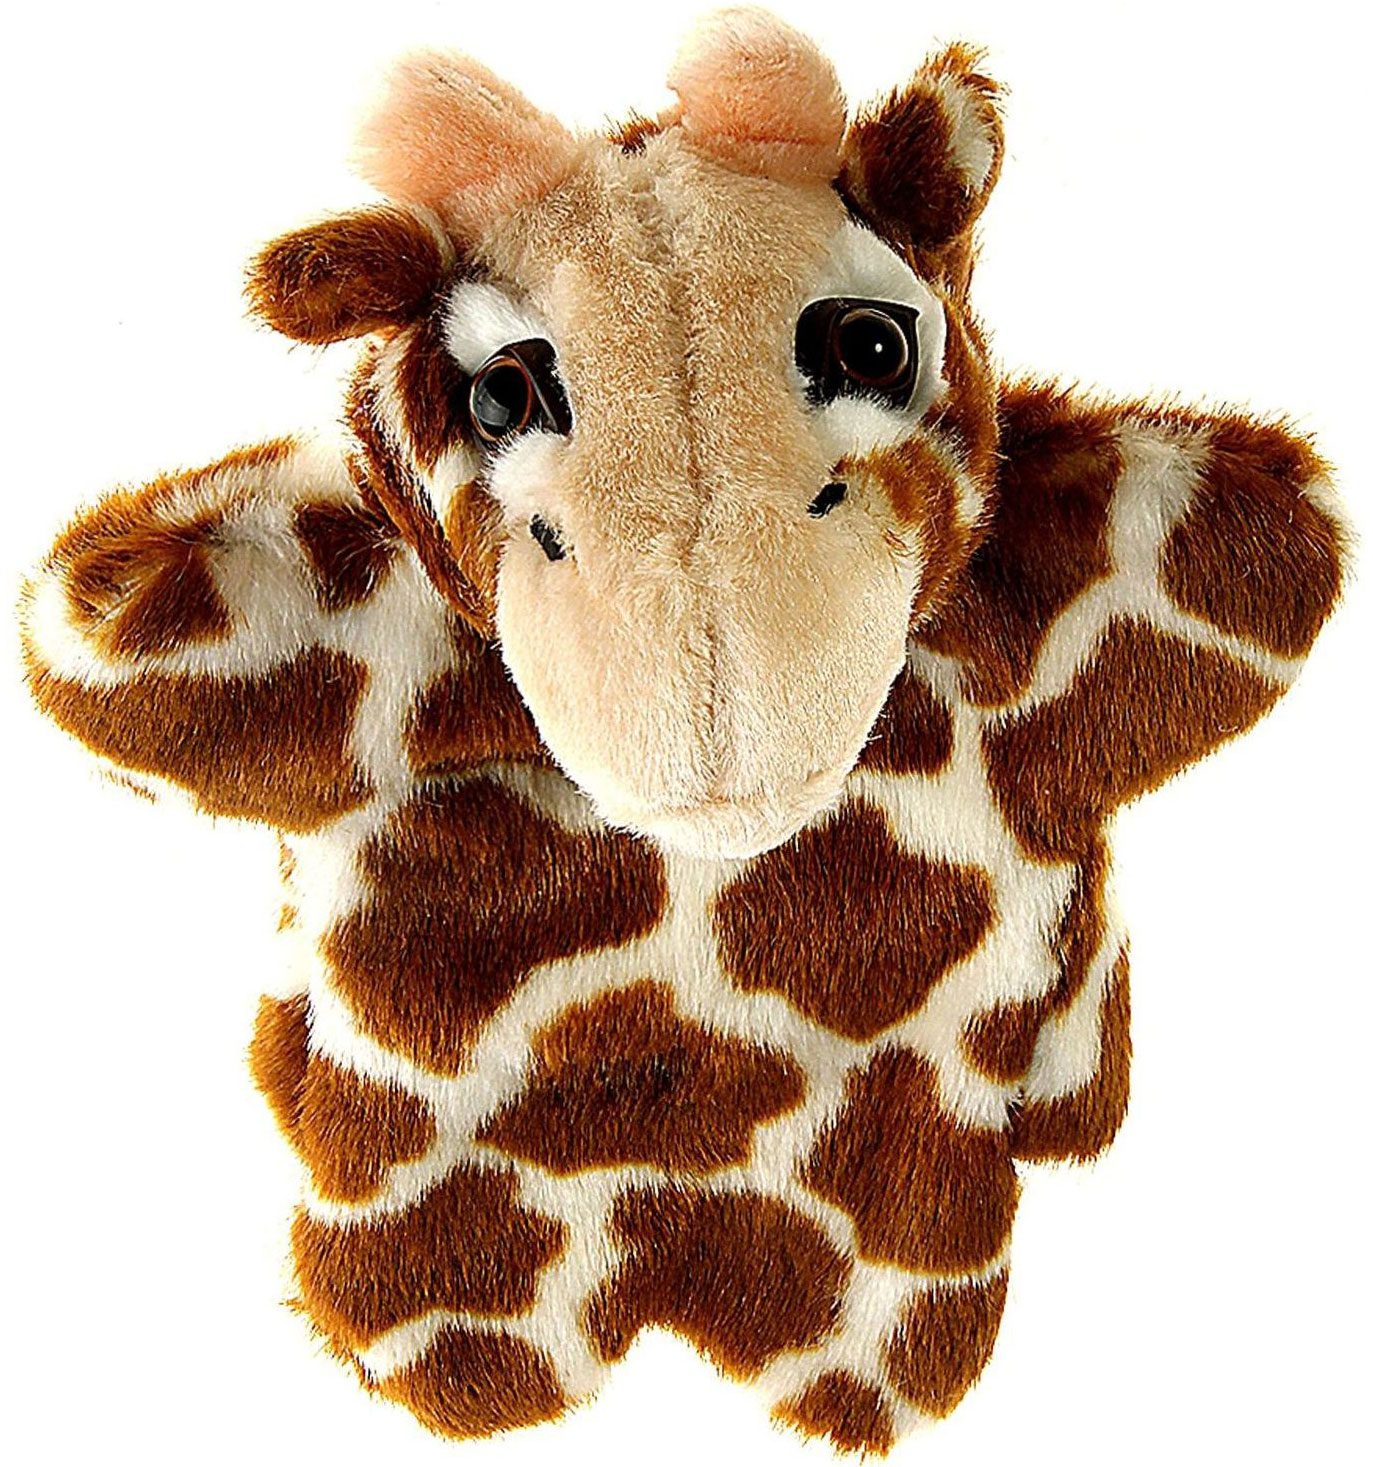 Sima-land Мягкая игрушка на руку Жираф 850207 sima land мягкая игрушка на руку мальчик 1147835